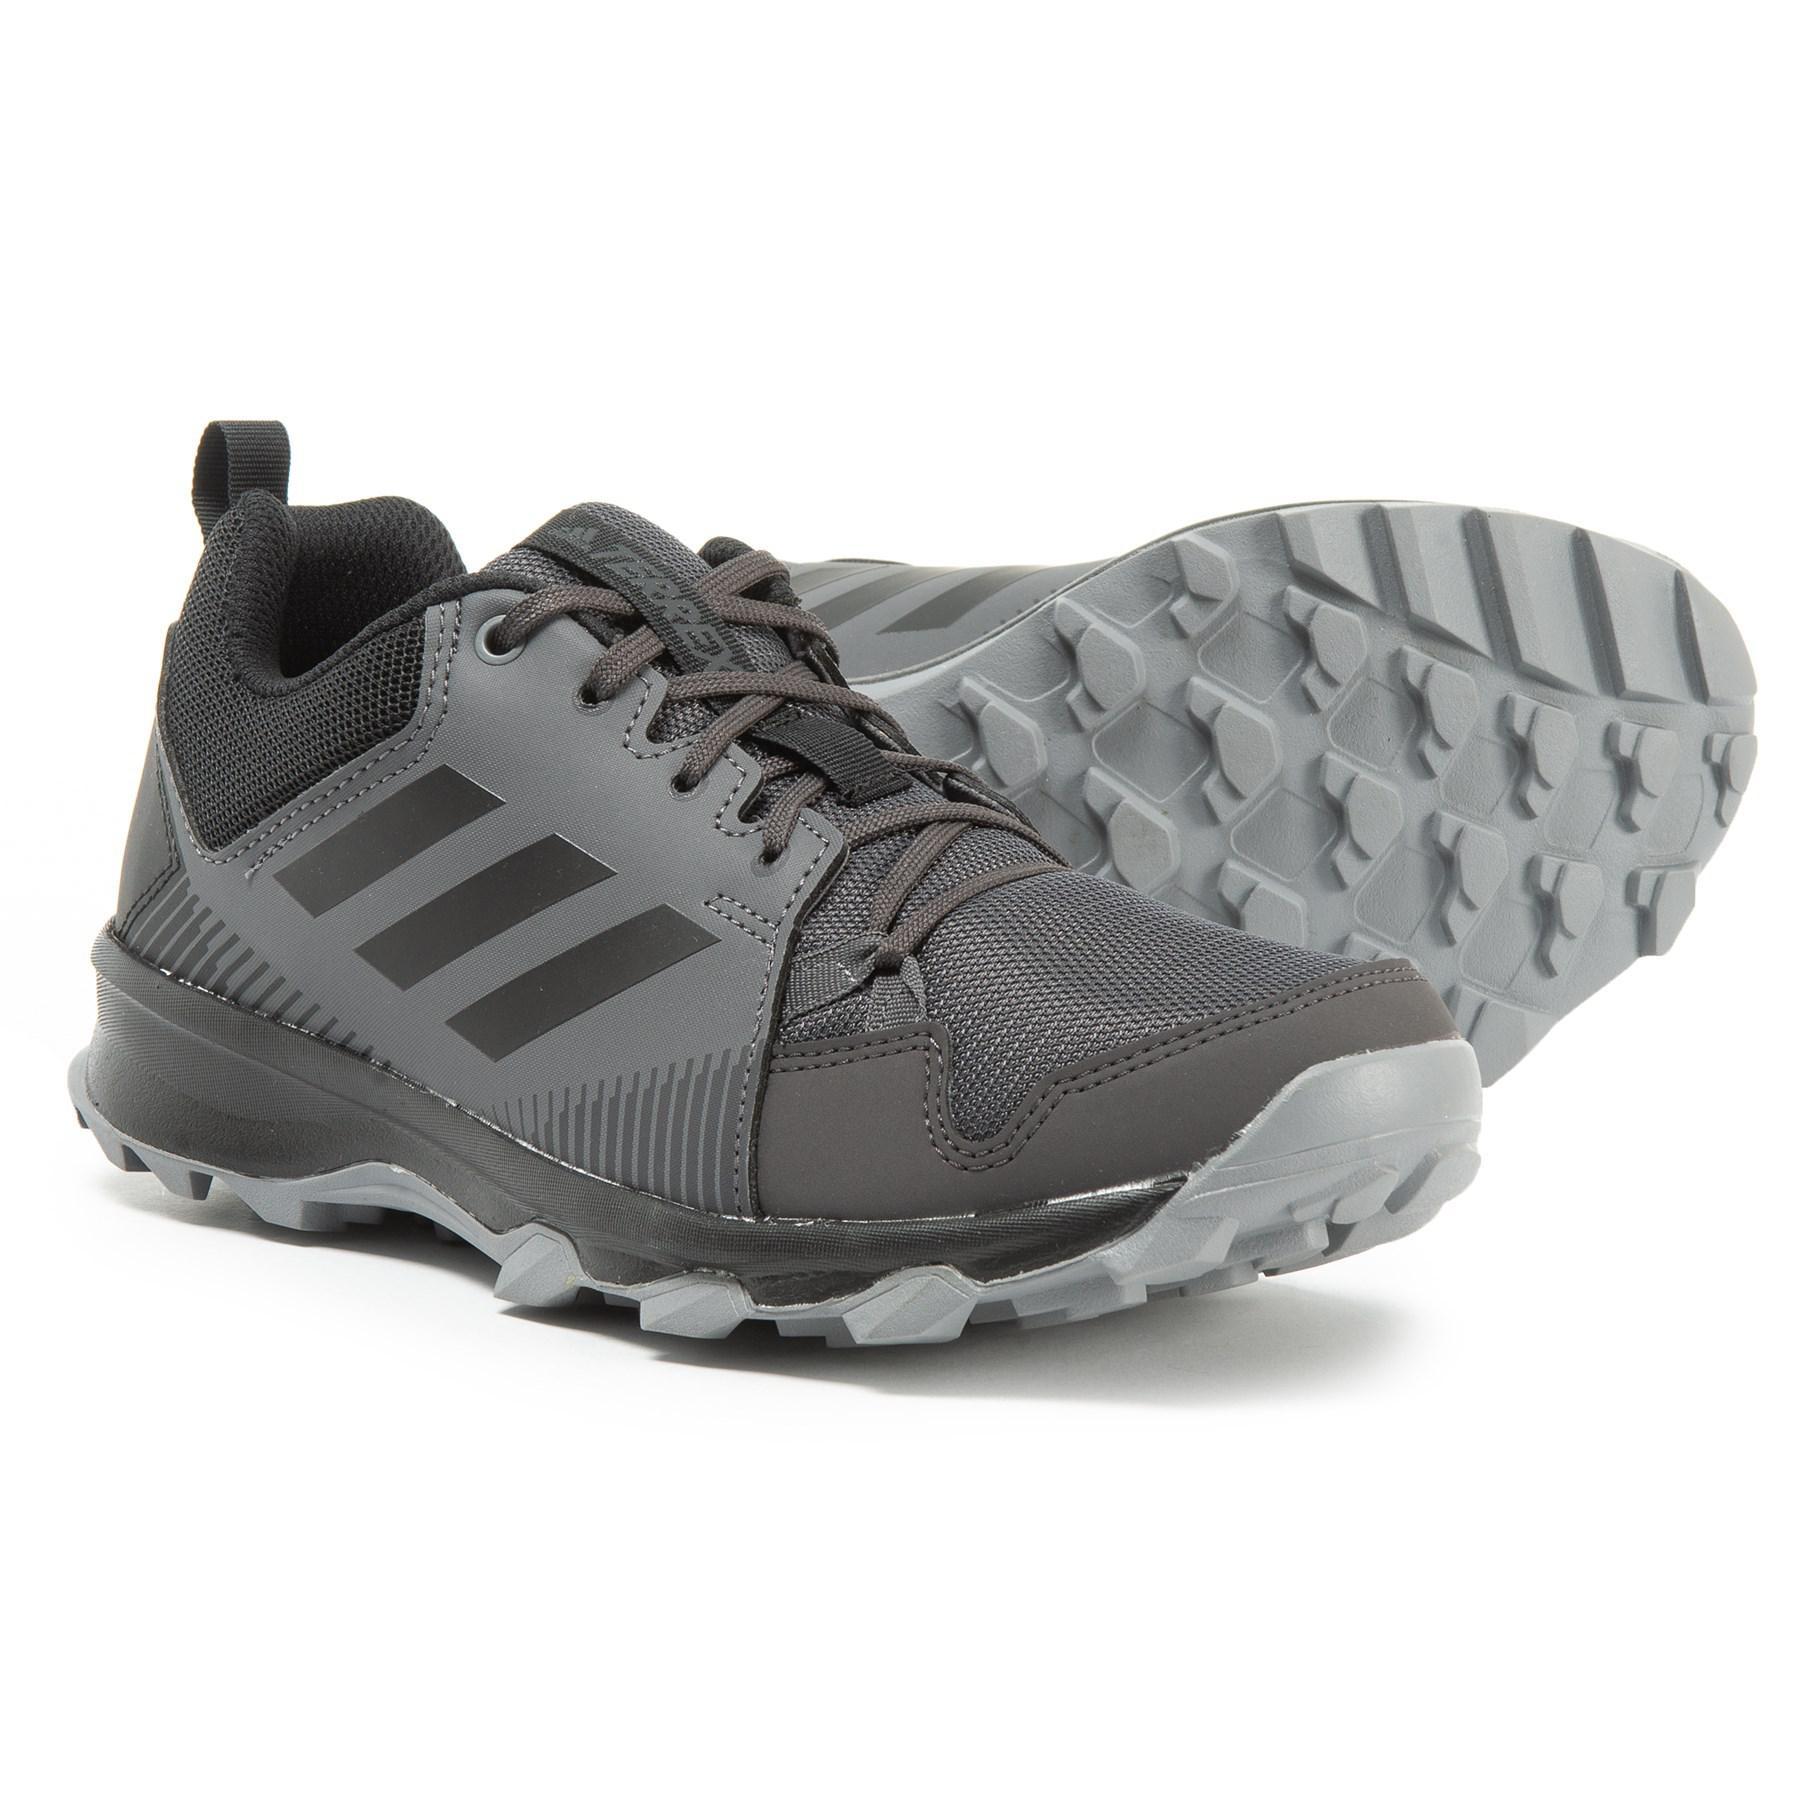 Lyst - adidas Terrex Tracerocker Trail Running Shoes (for Women) in Gray 40aaca3c4